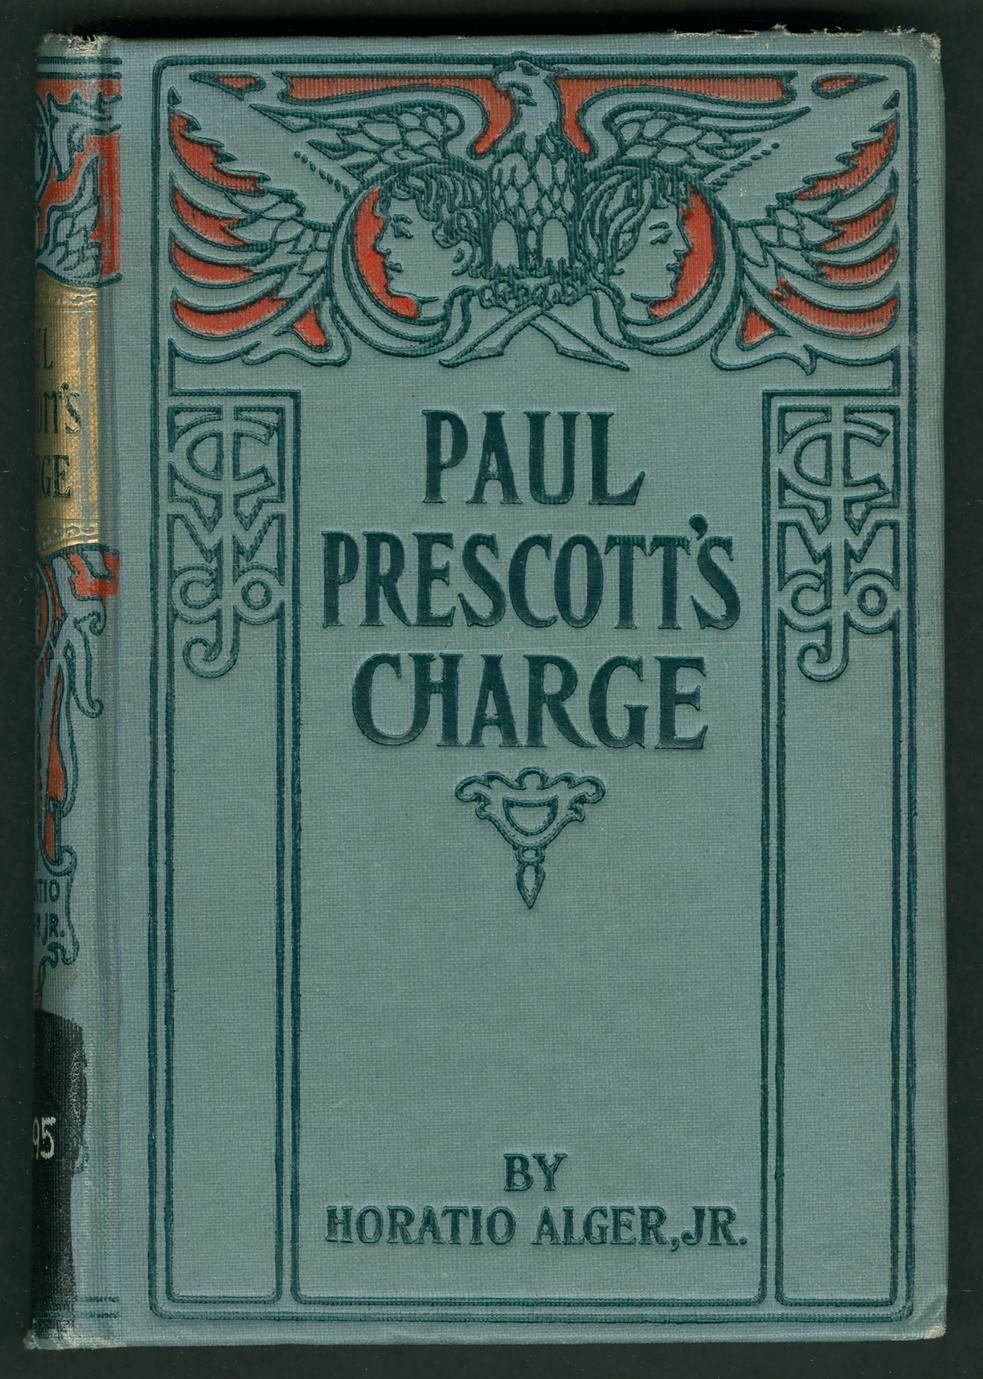 Paul Prescott's charge (1 of 2)